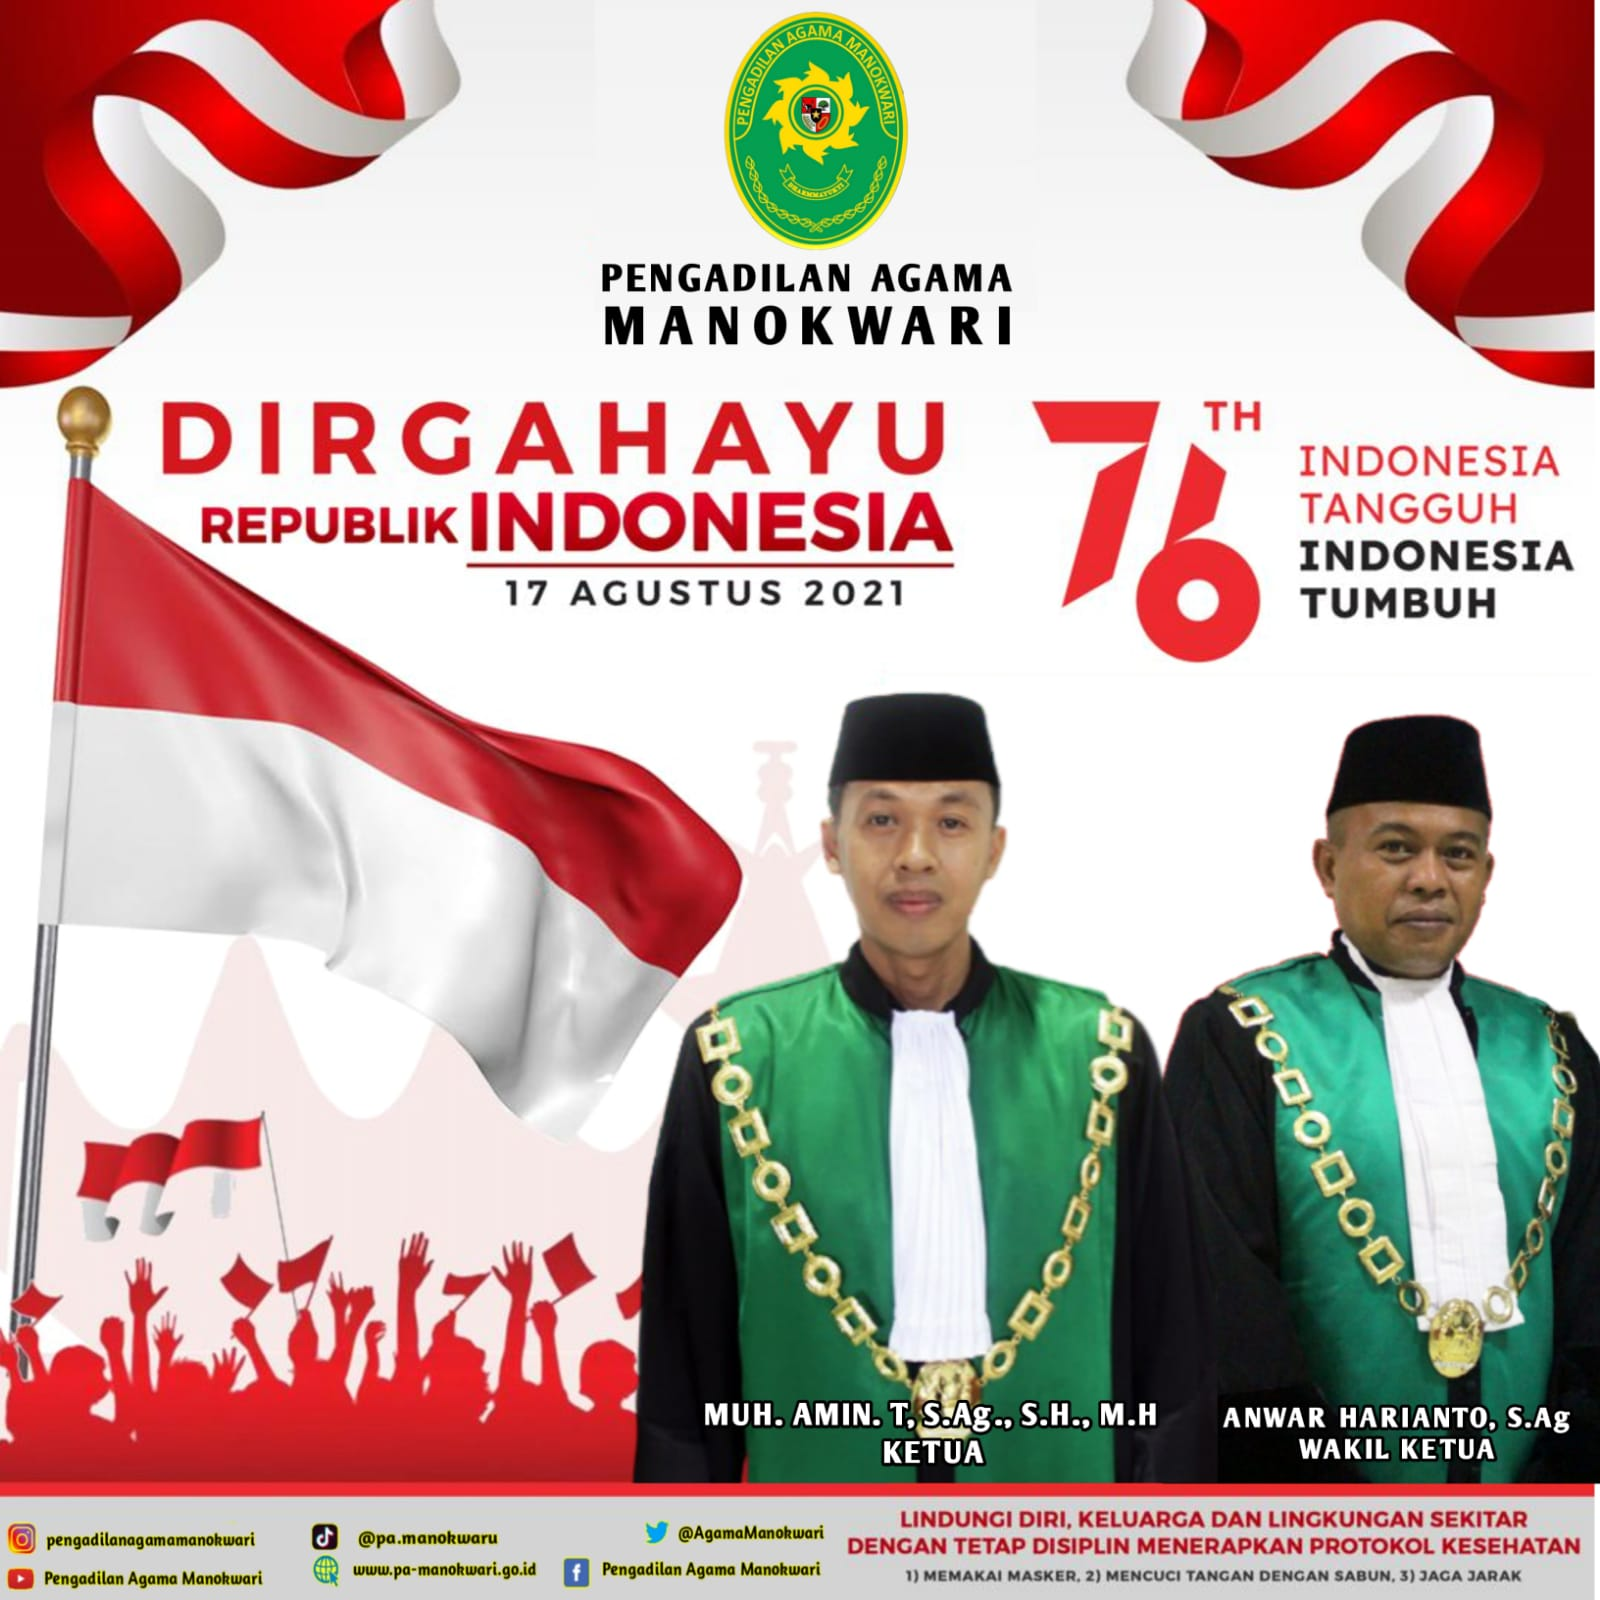 SELAMAT HARI ULANG TAHUN REPUBLIK INDONESIA KE- 76